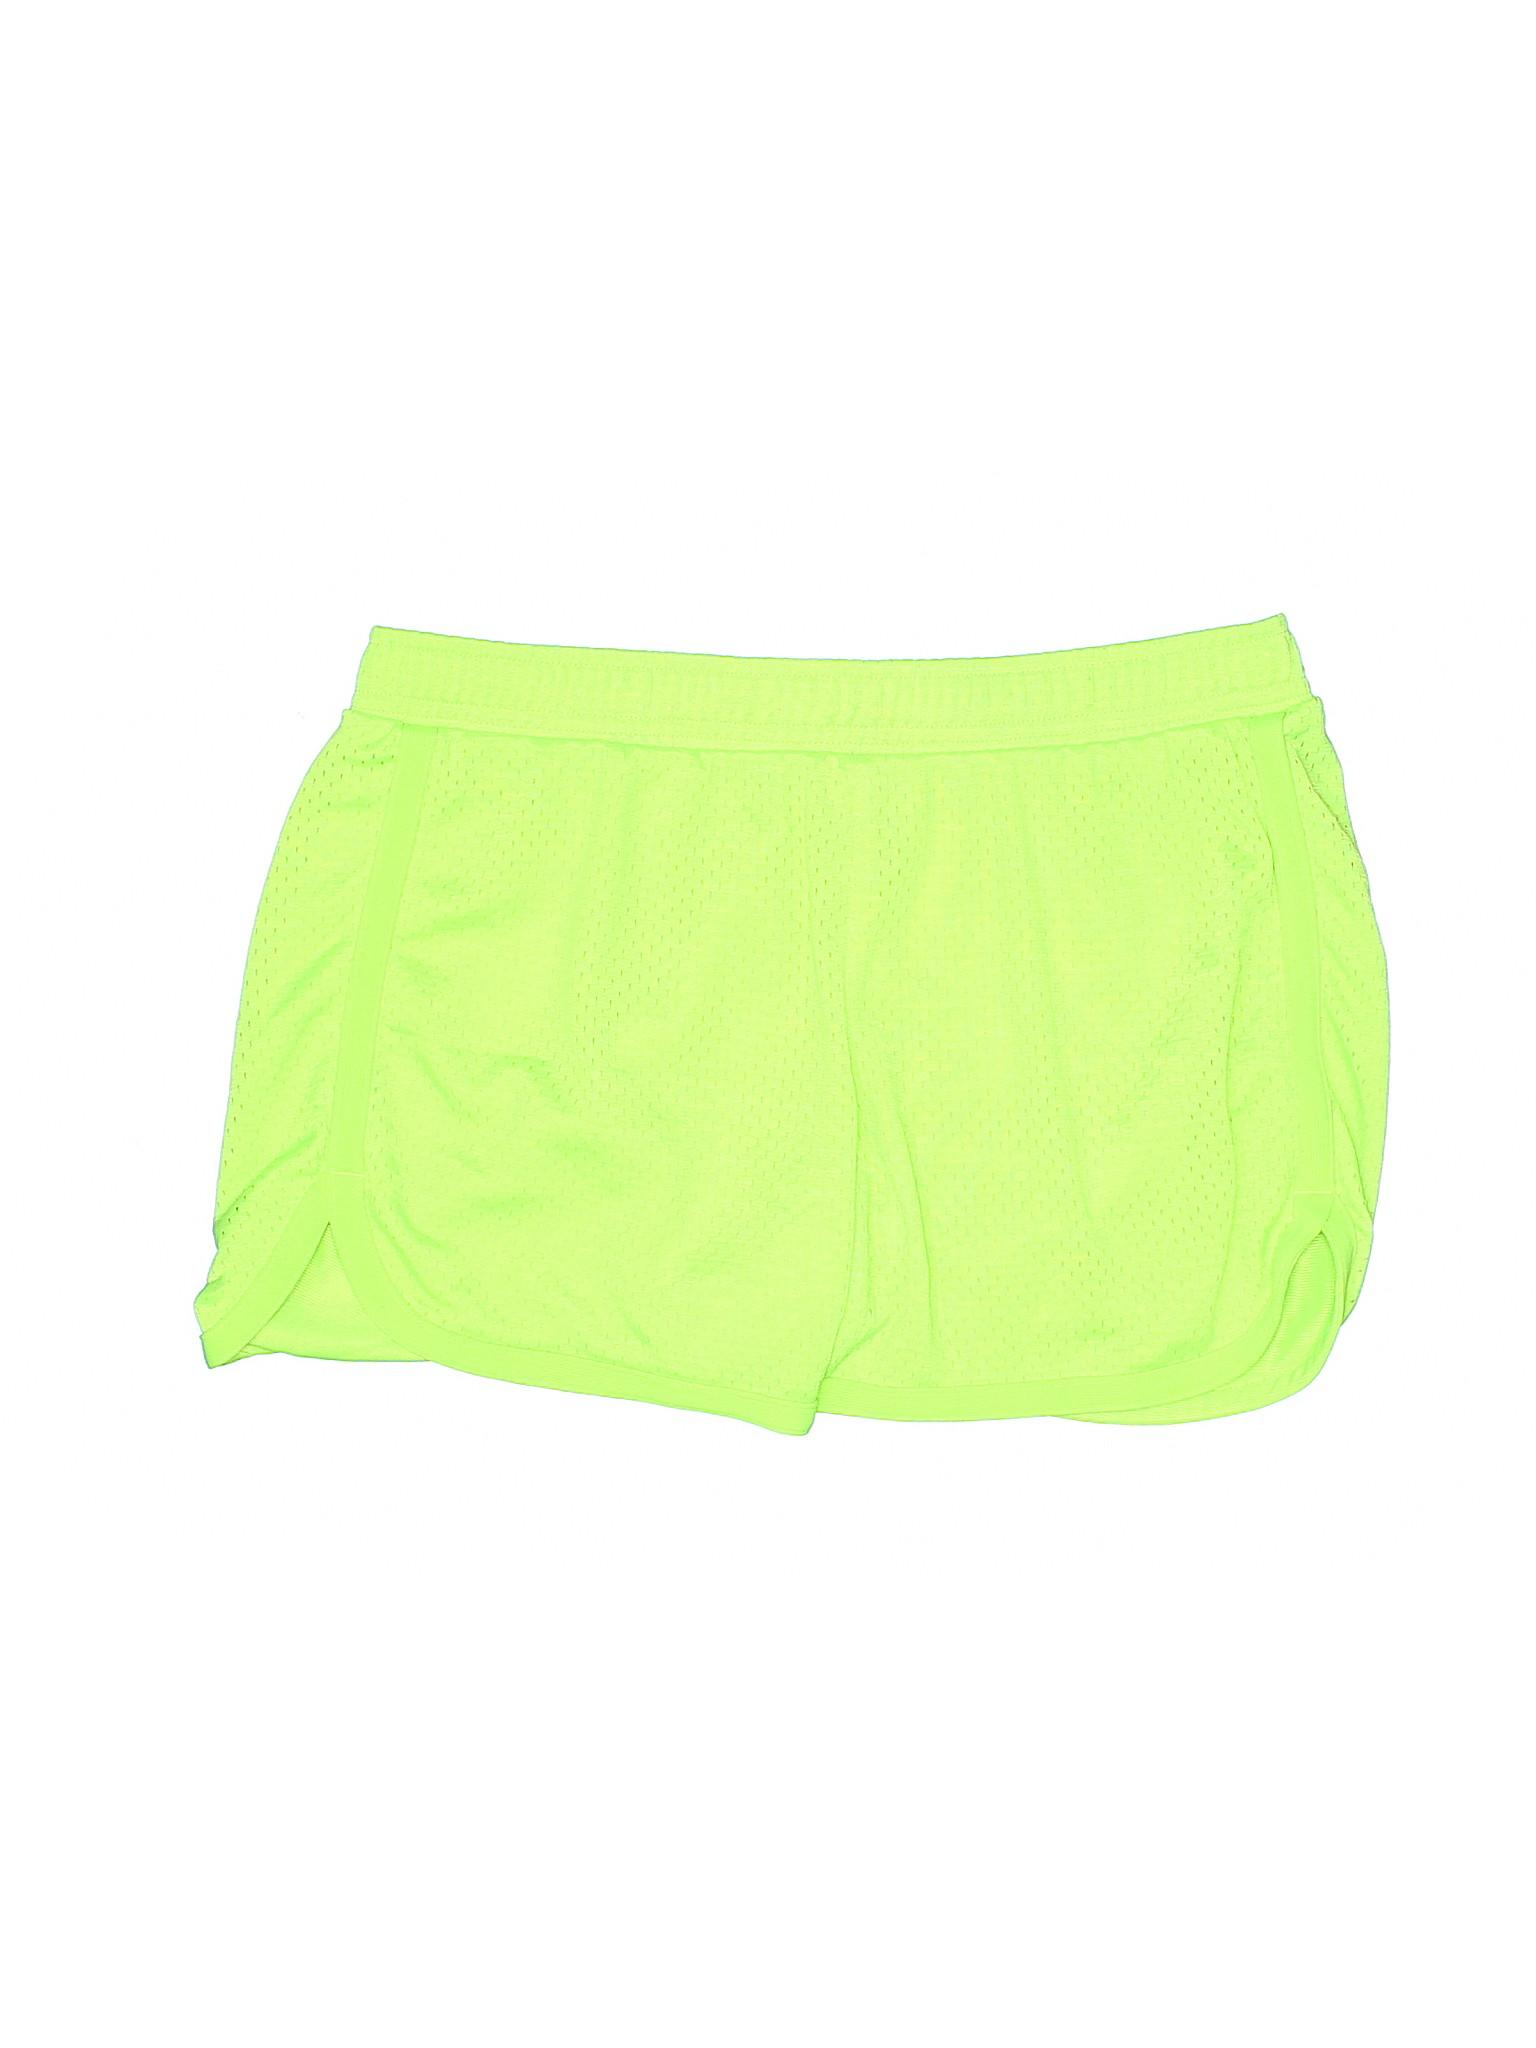 Shorts Athletic Boutique Shorts Xersion Boutique Athletic Boutique Xersion w0Tq0RC